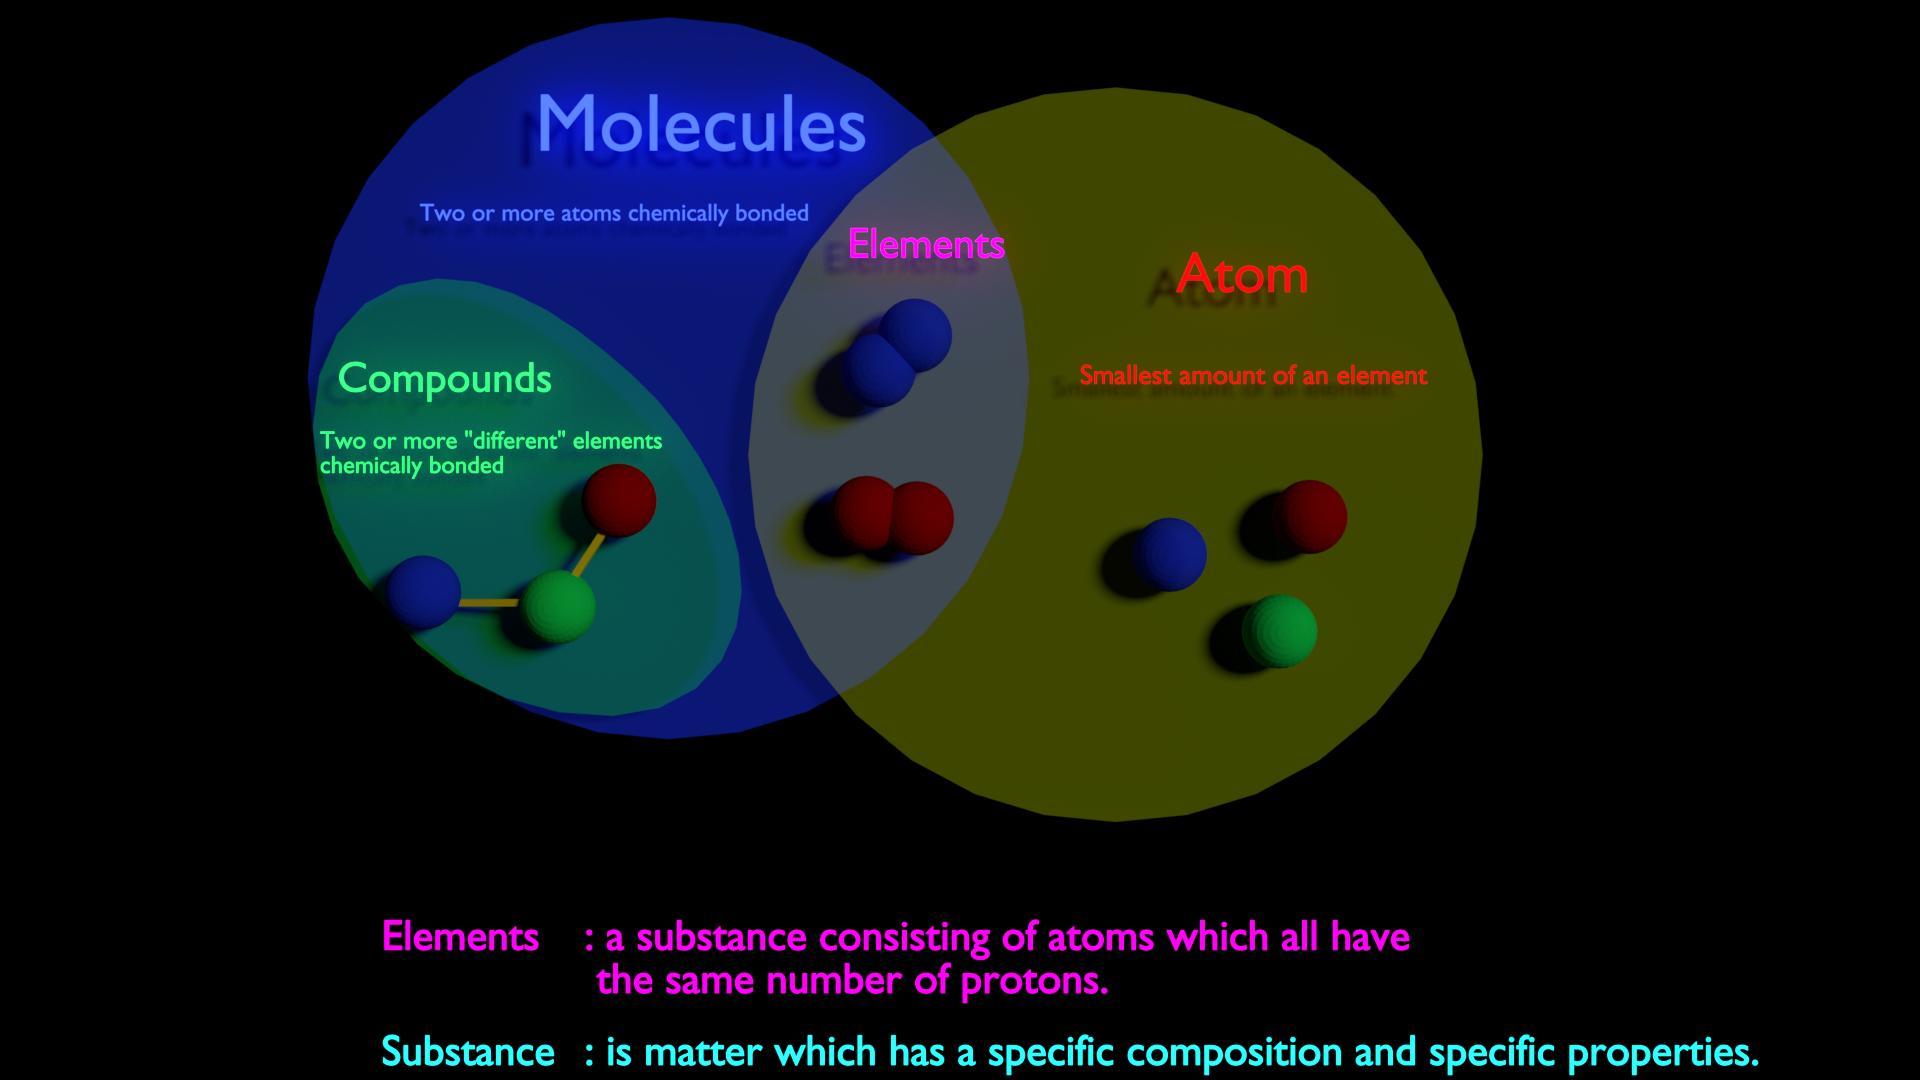 hight resolution of visual explanation between molecule vs compound vs element vs atom vs substance